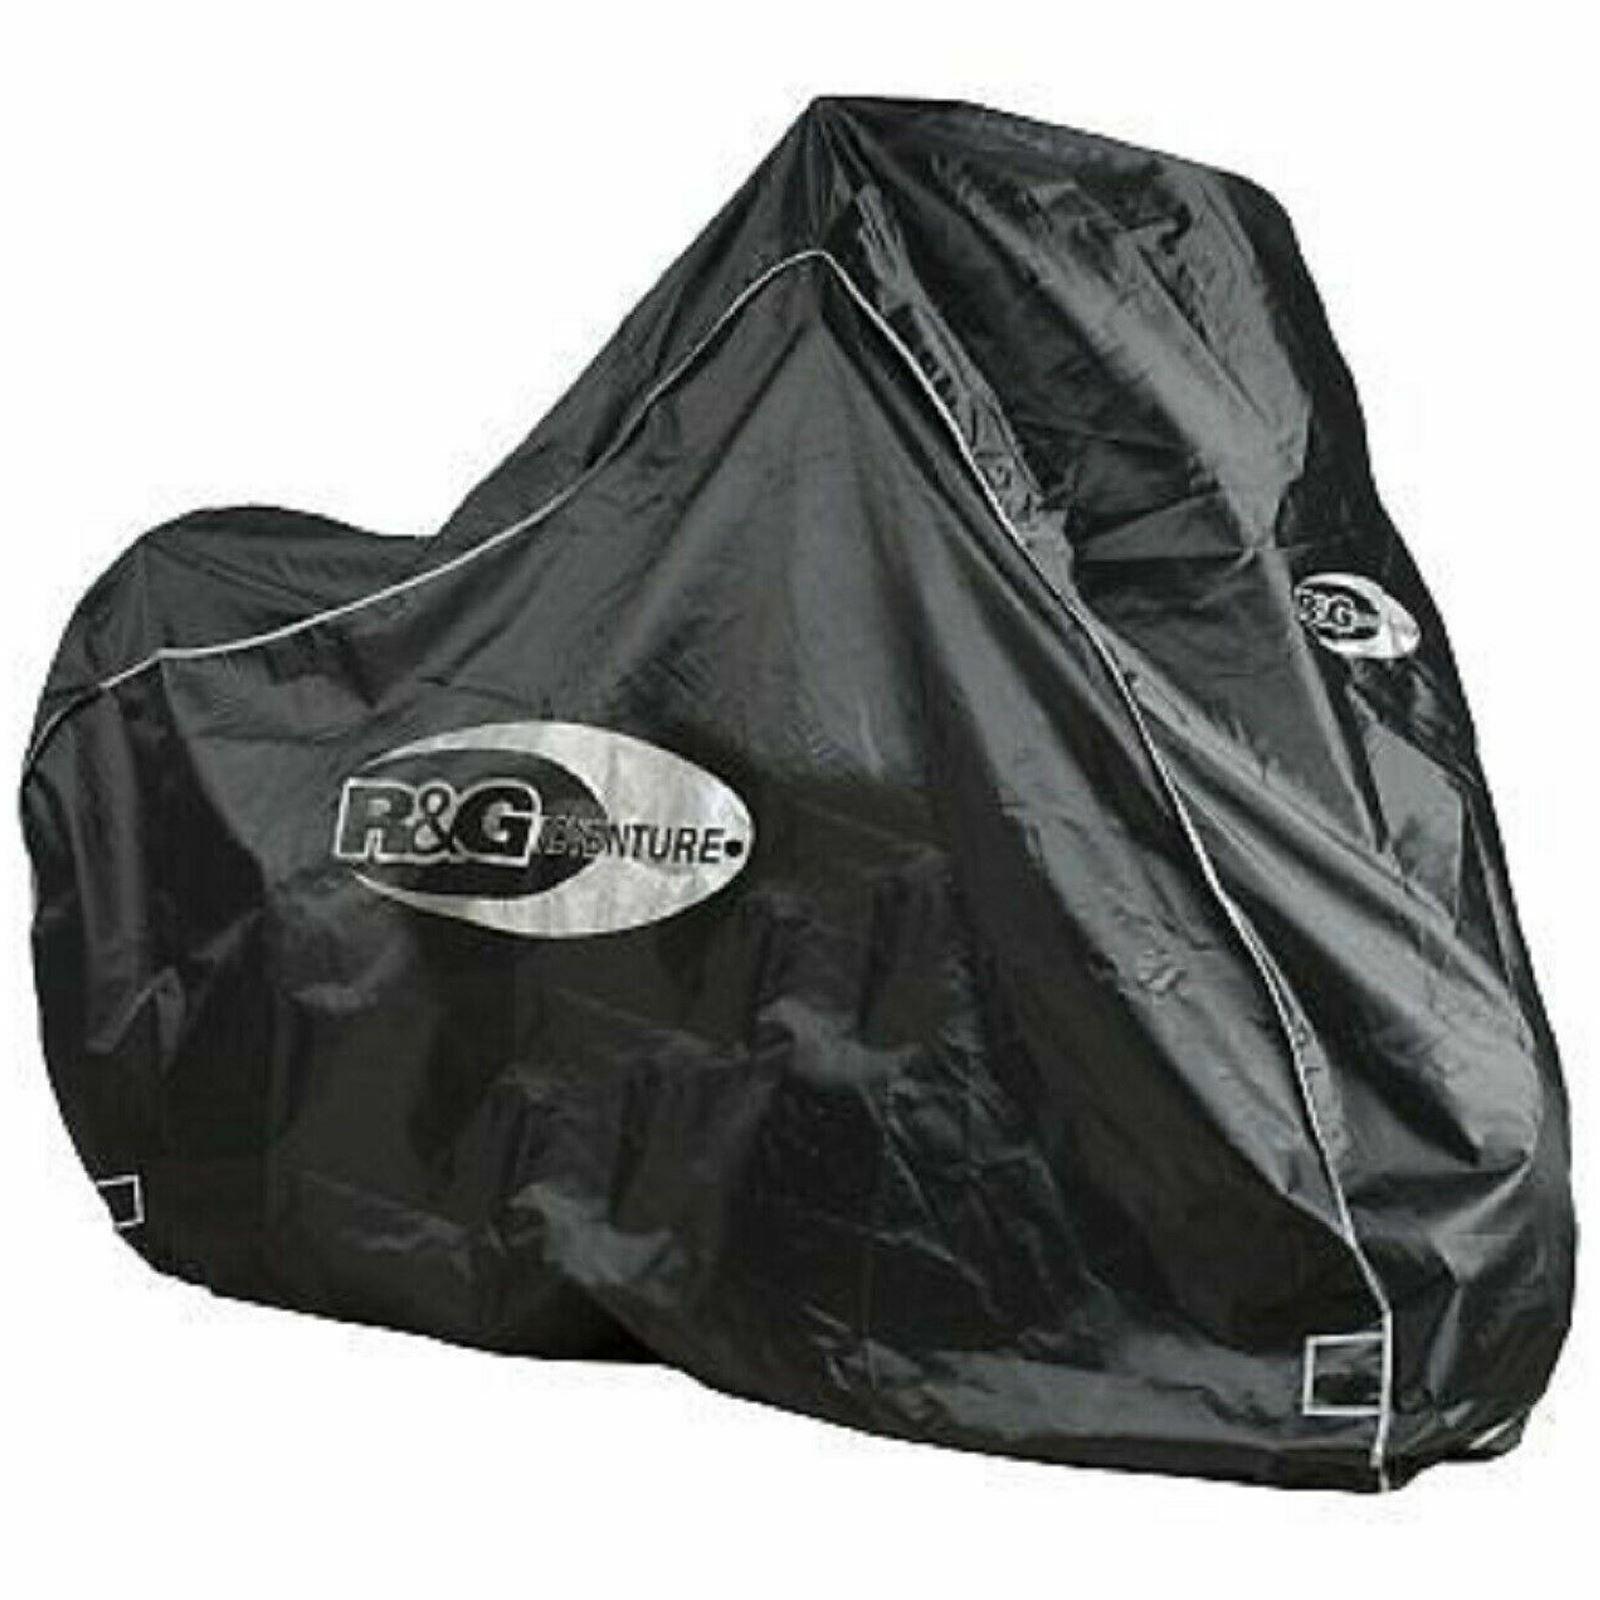 R&G Motorcycle Adventure Bike Outdoor Waterproof Protective Rain Cover - Black